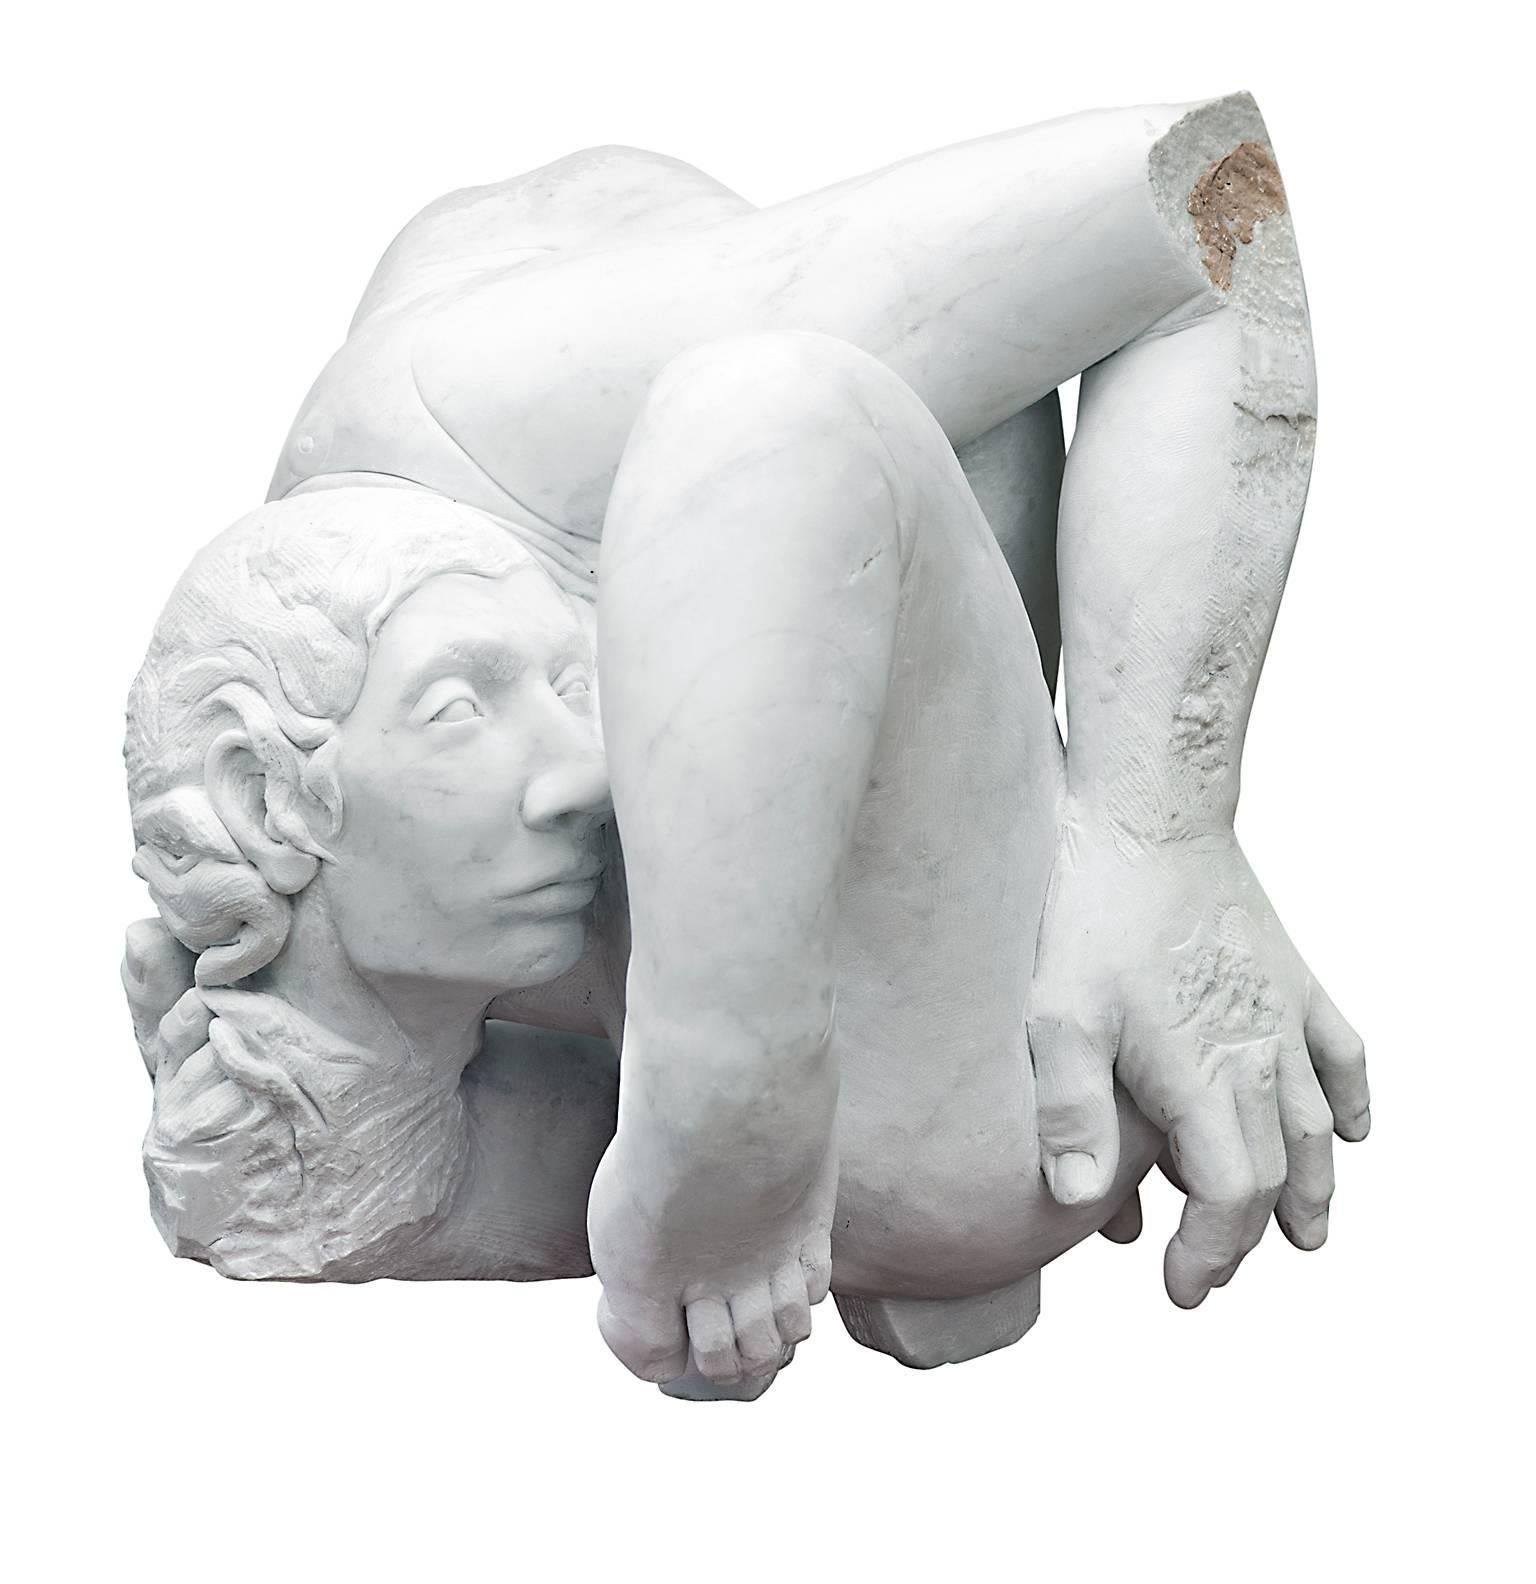 Embrione - hand carved figurative nude Carrara marble sculpture